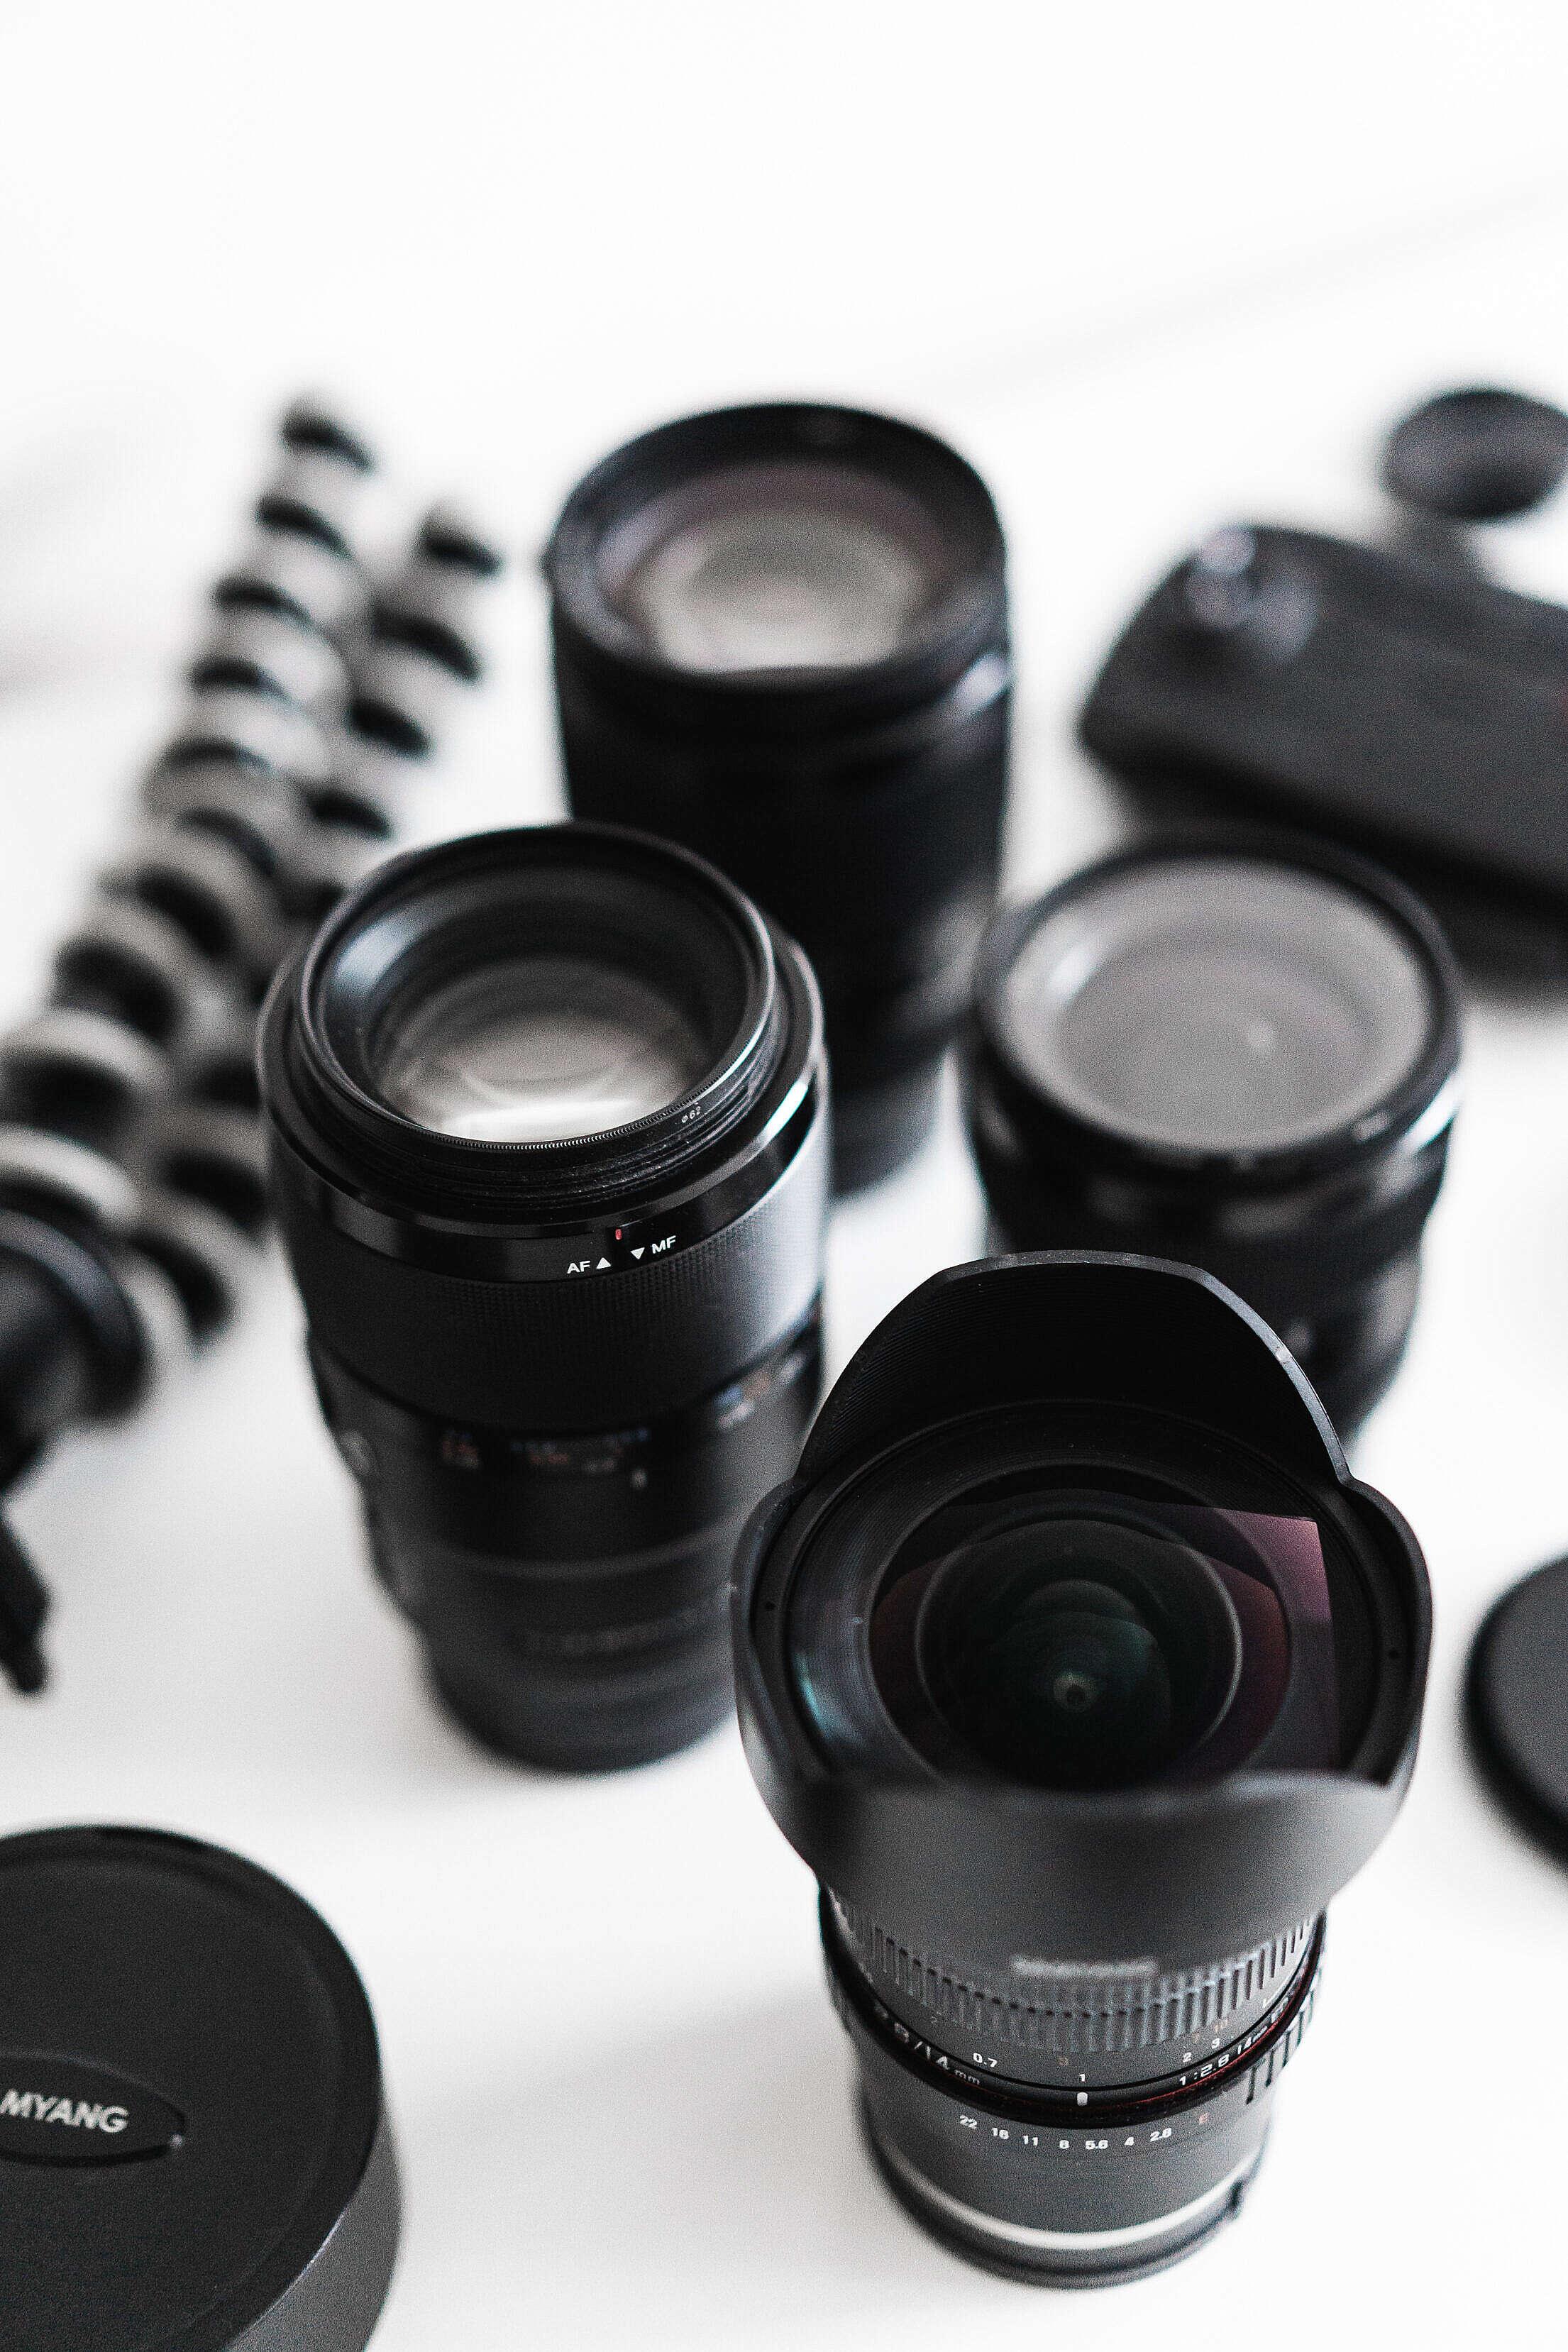 Photographer's Gear Lenses Free Stock Photo